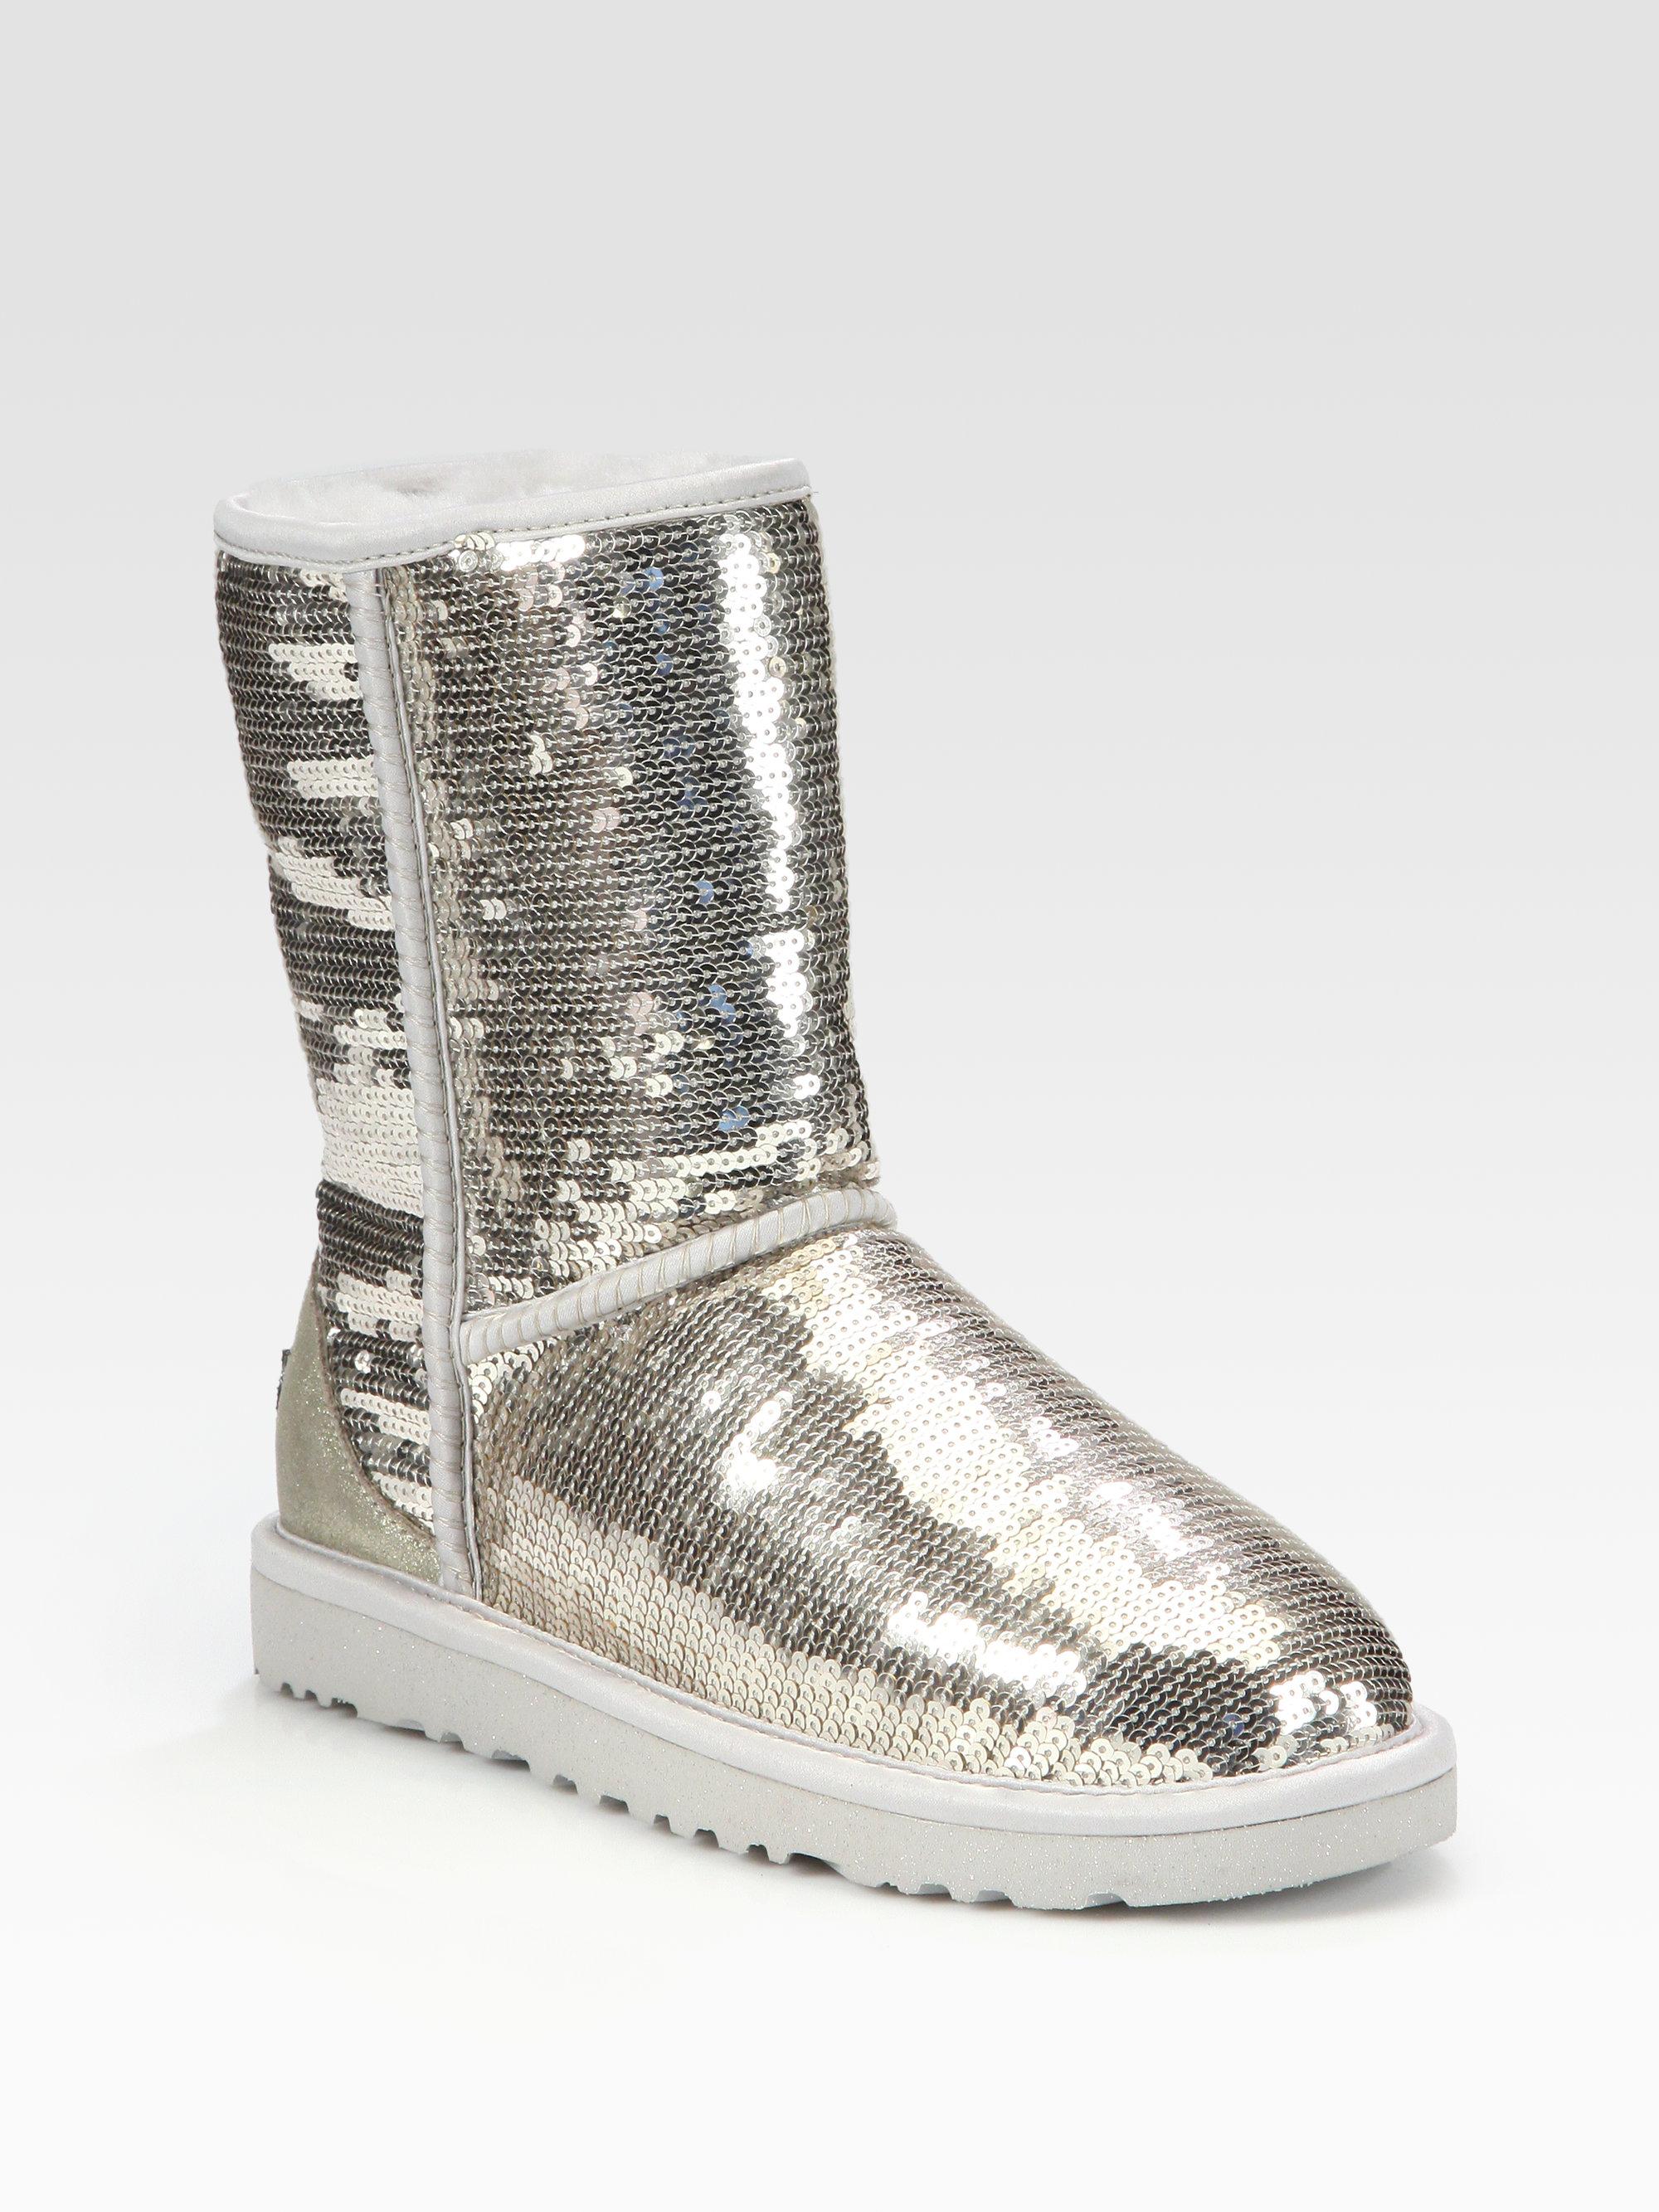 493210e51c4 UGG Classic Short Suede Sequin Boots in Metallic - Lyst